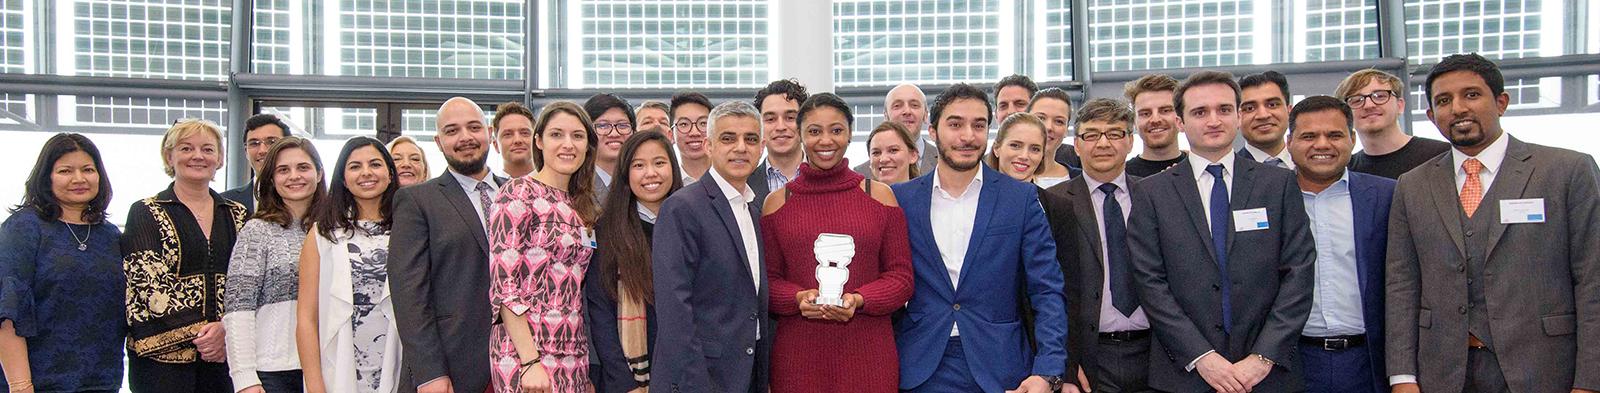 Mayors Entrepreneur. Shortlisters, winners and Sadiq Khan, Mayor of London